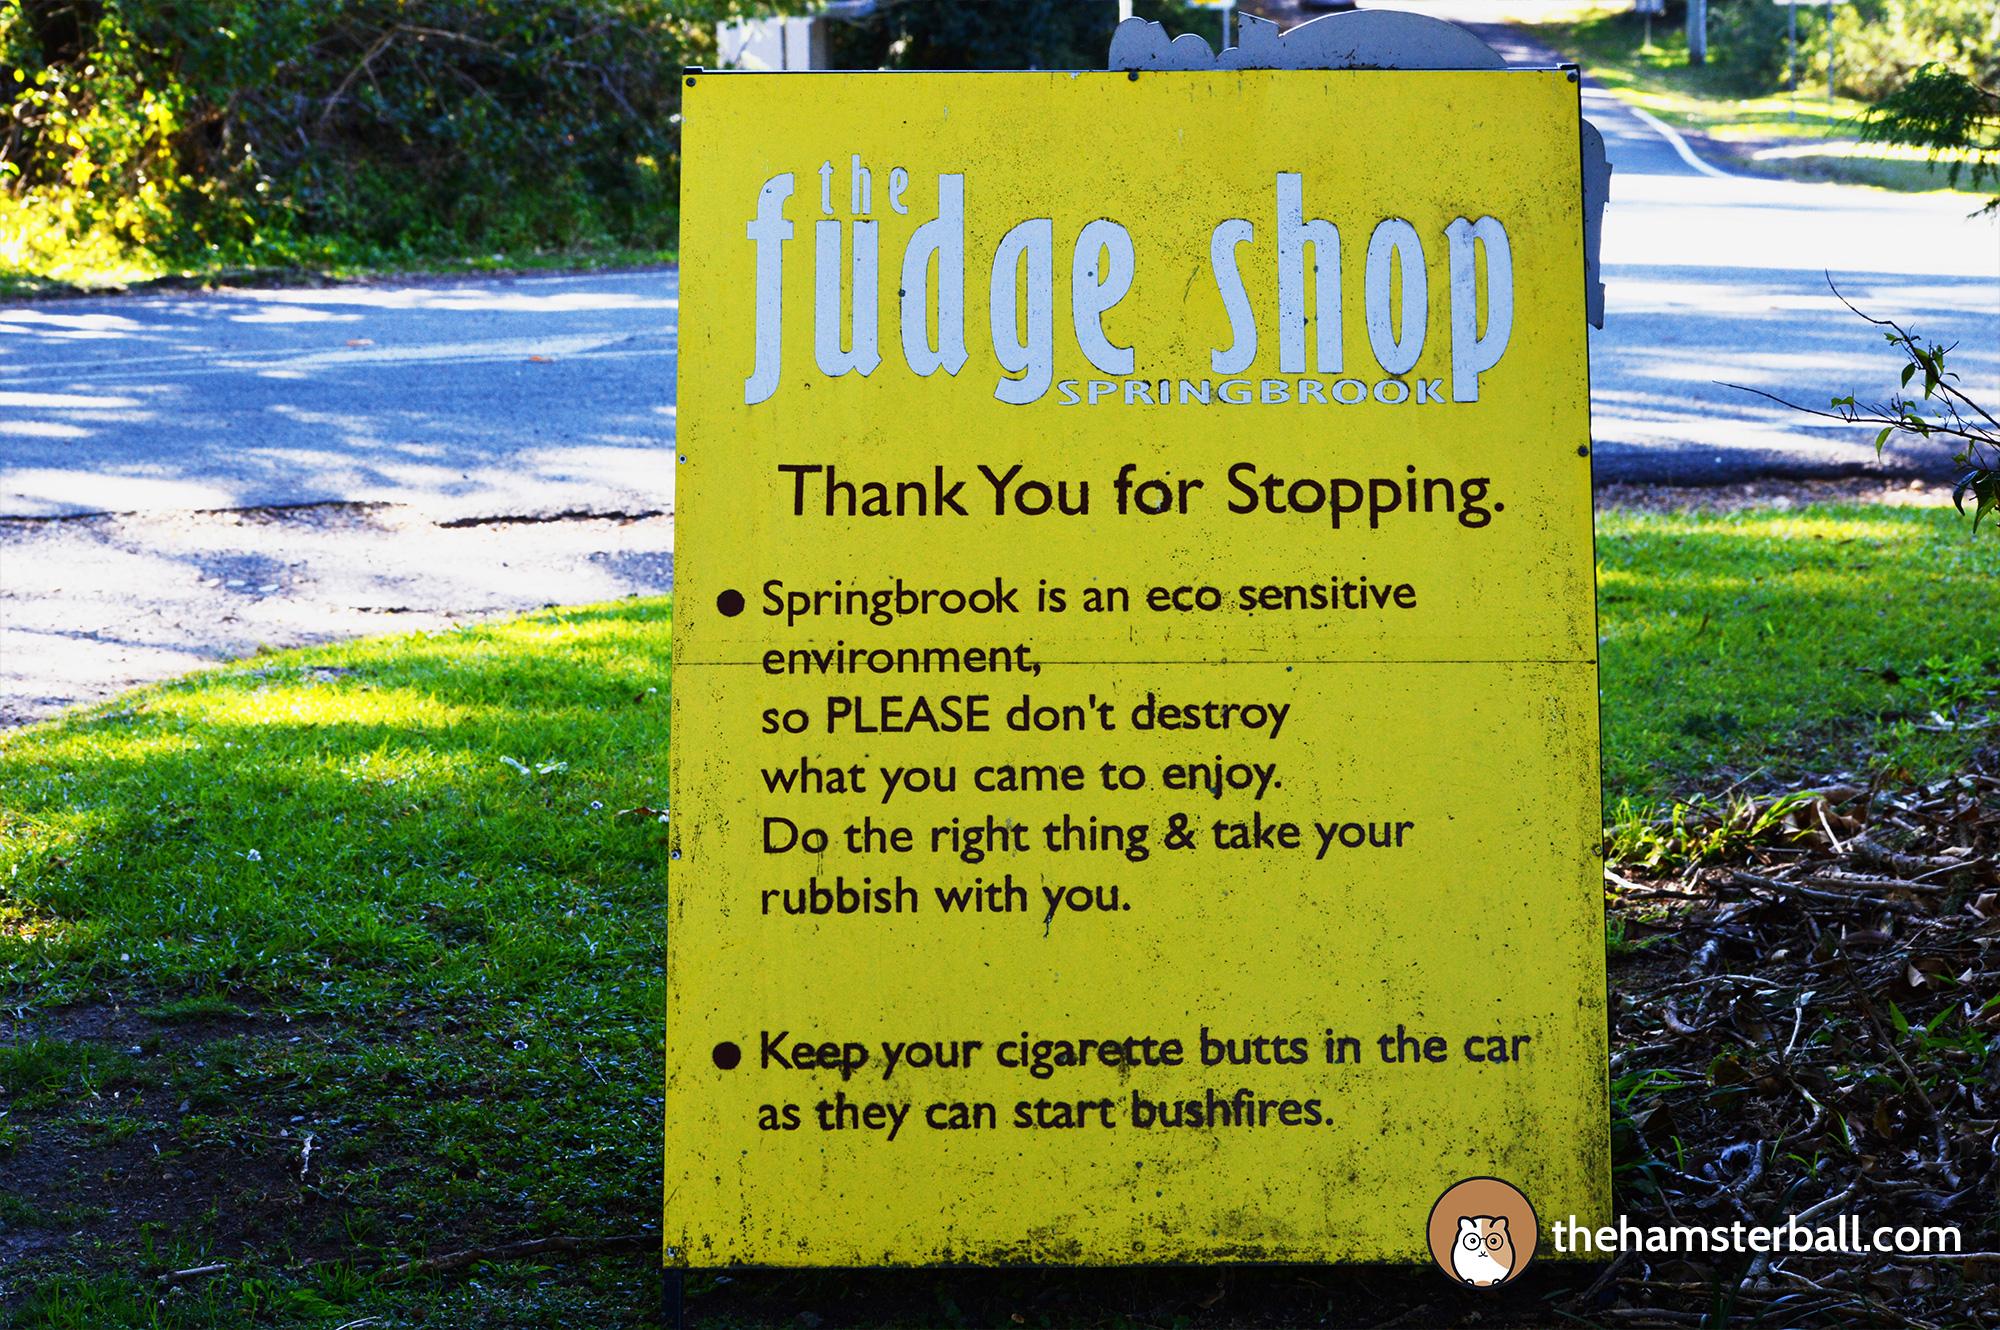 The Fudge Shop, Environment, Caution, Springbrook, Ecosensitve